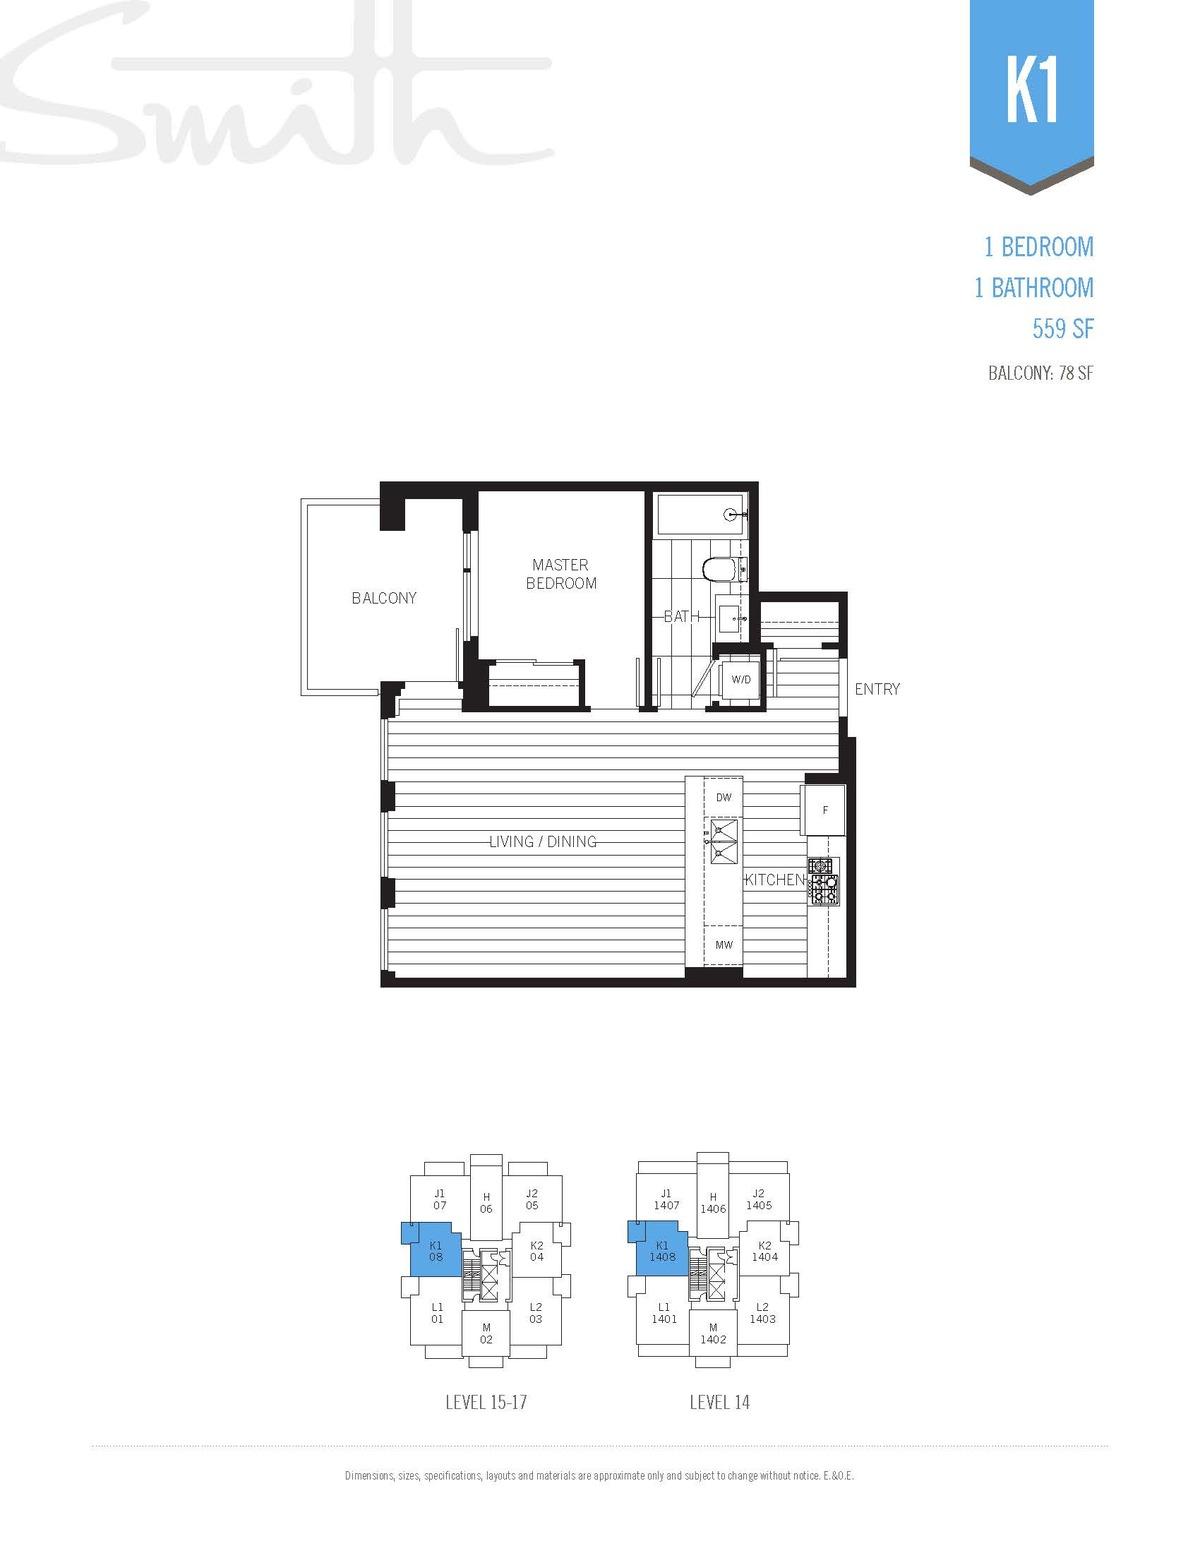 Smith Floorplan K1